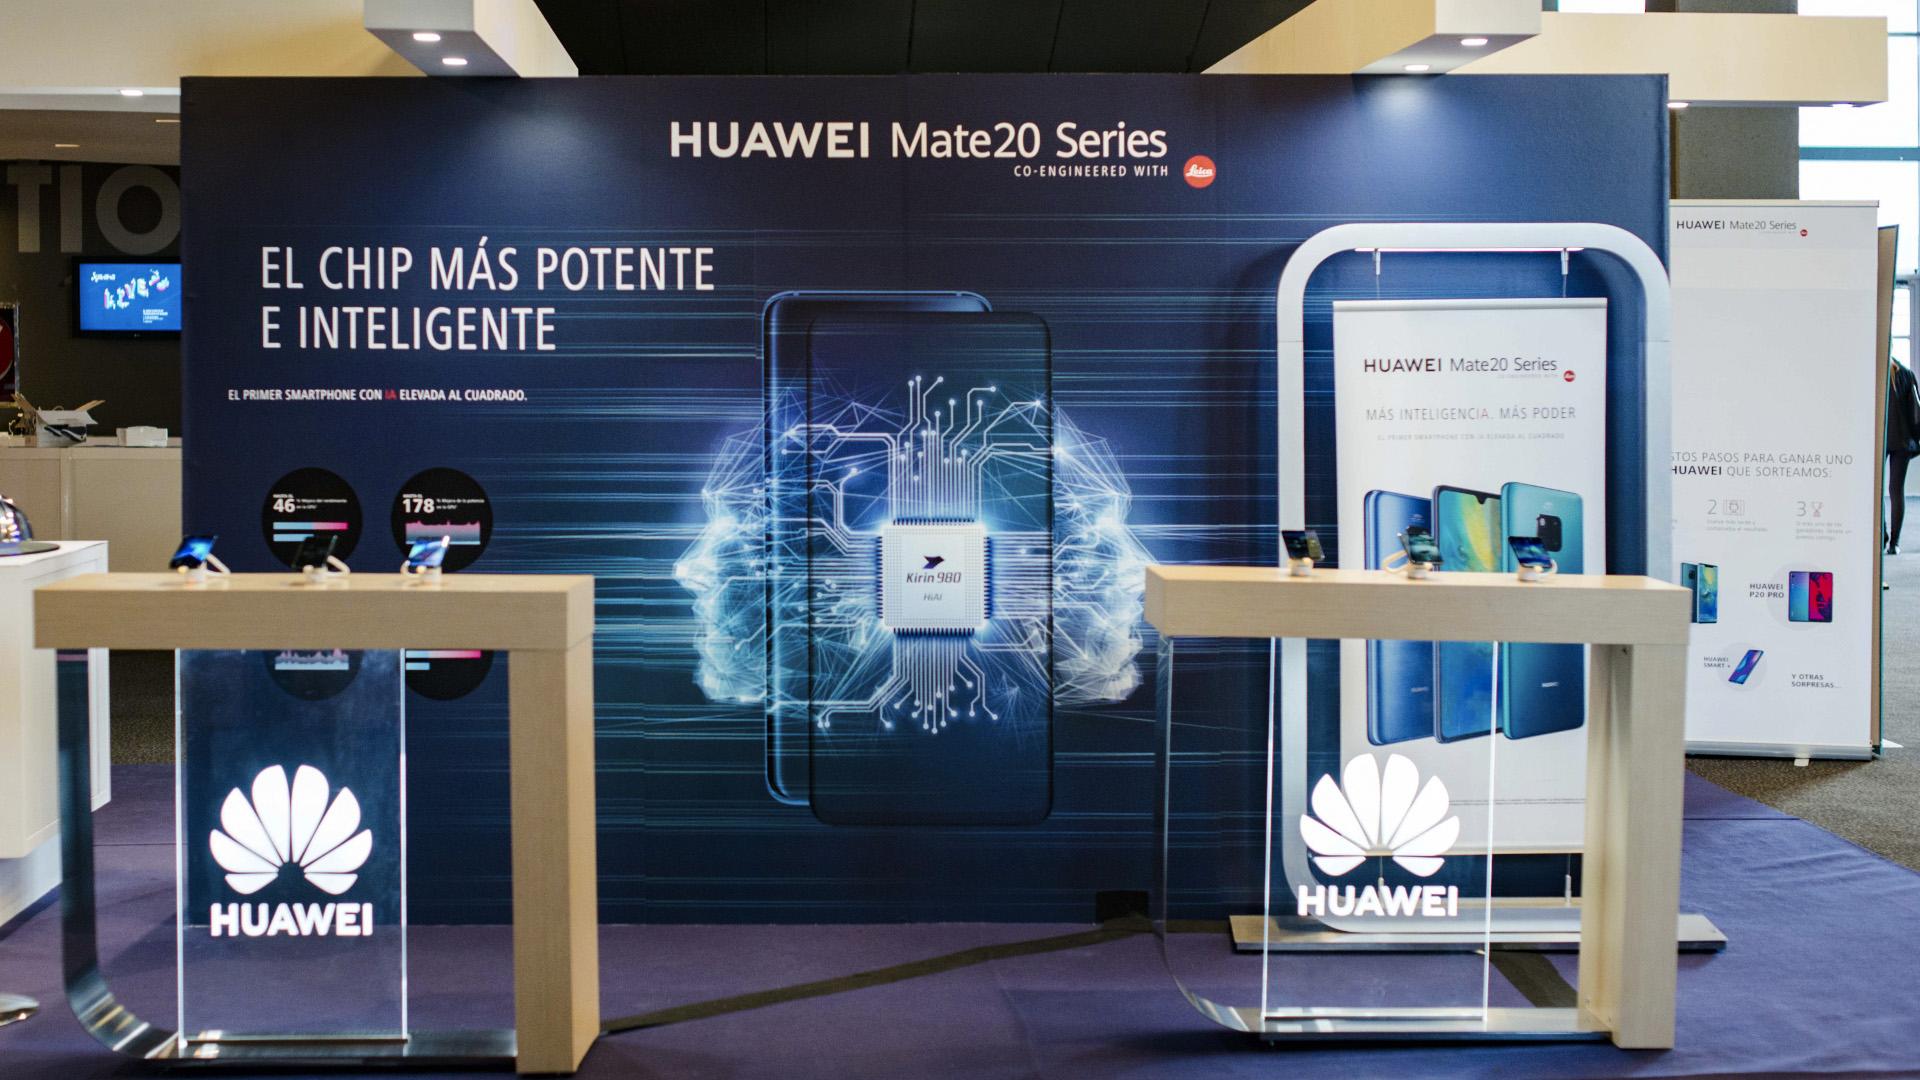 Éxito rotundo de Huawei en su paso por Xataka 2018